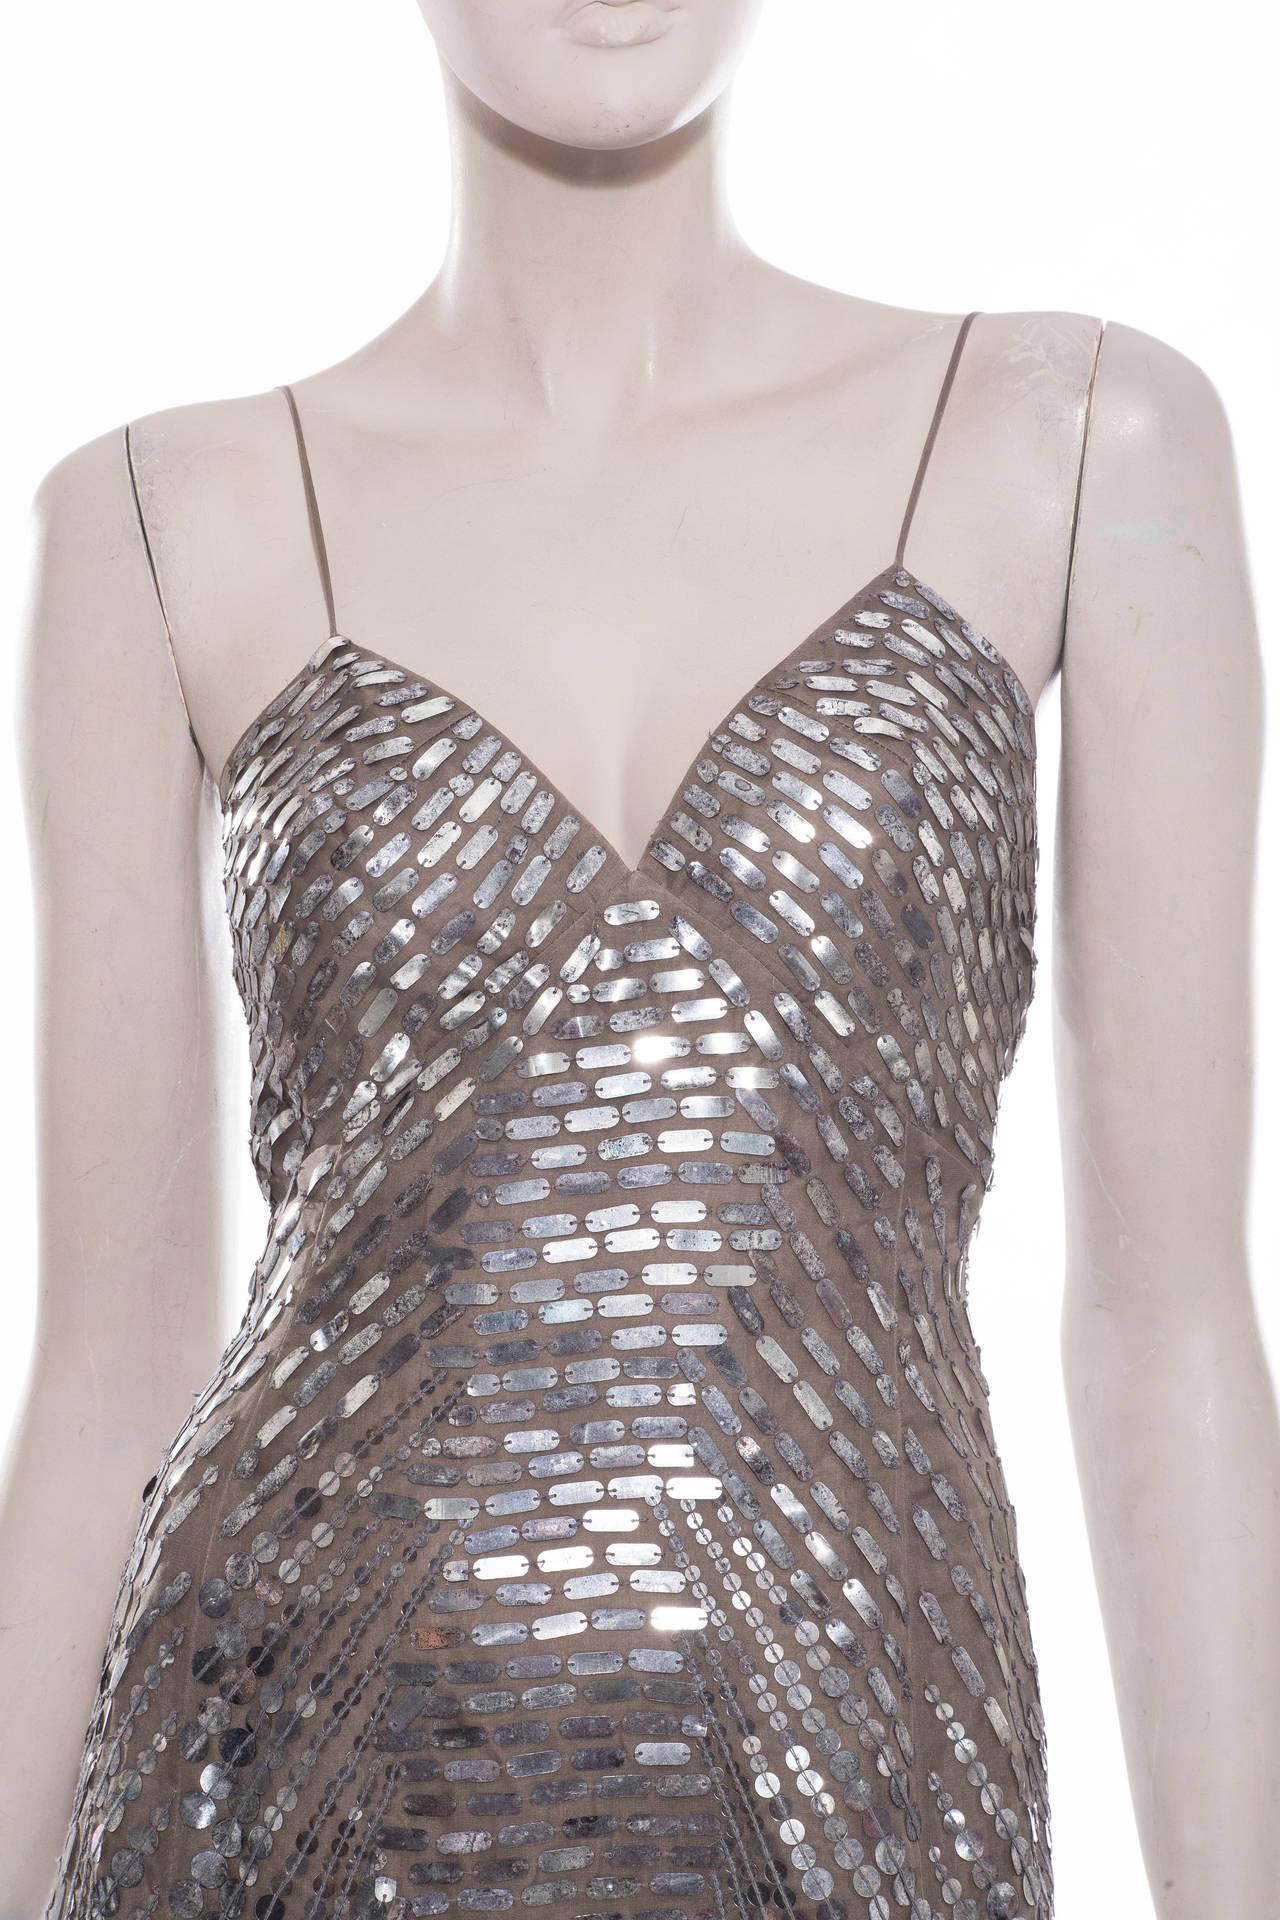 Oscar De la Renta Silk Evening Dress With Pewter Embellishments, Fall 2007 6